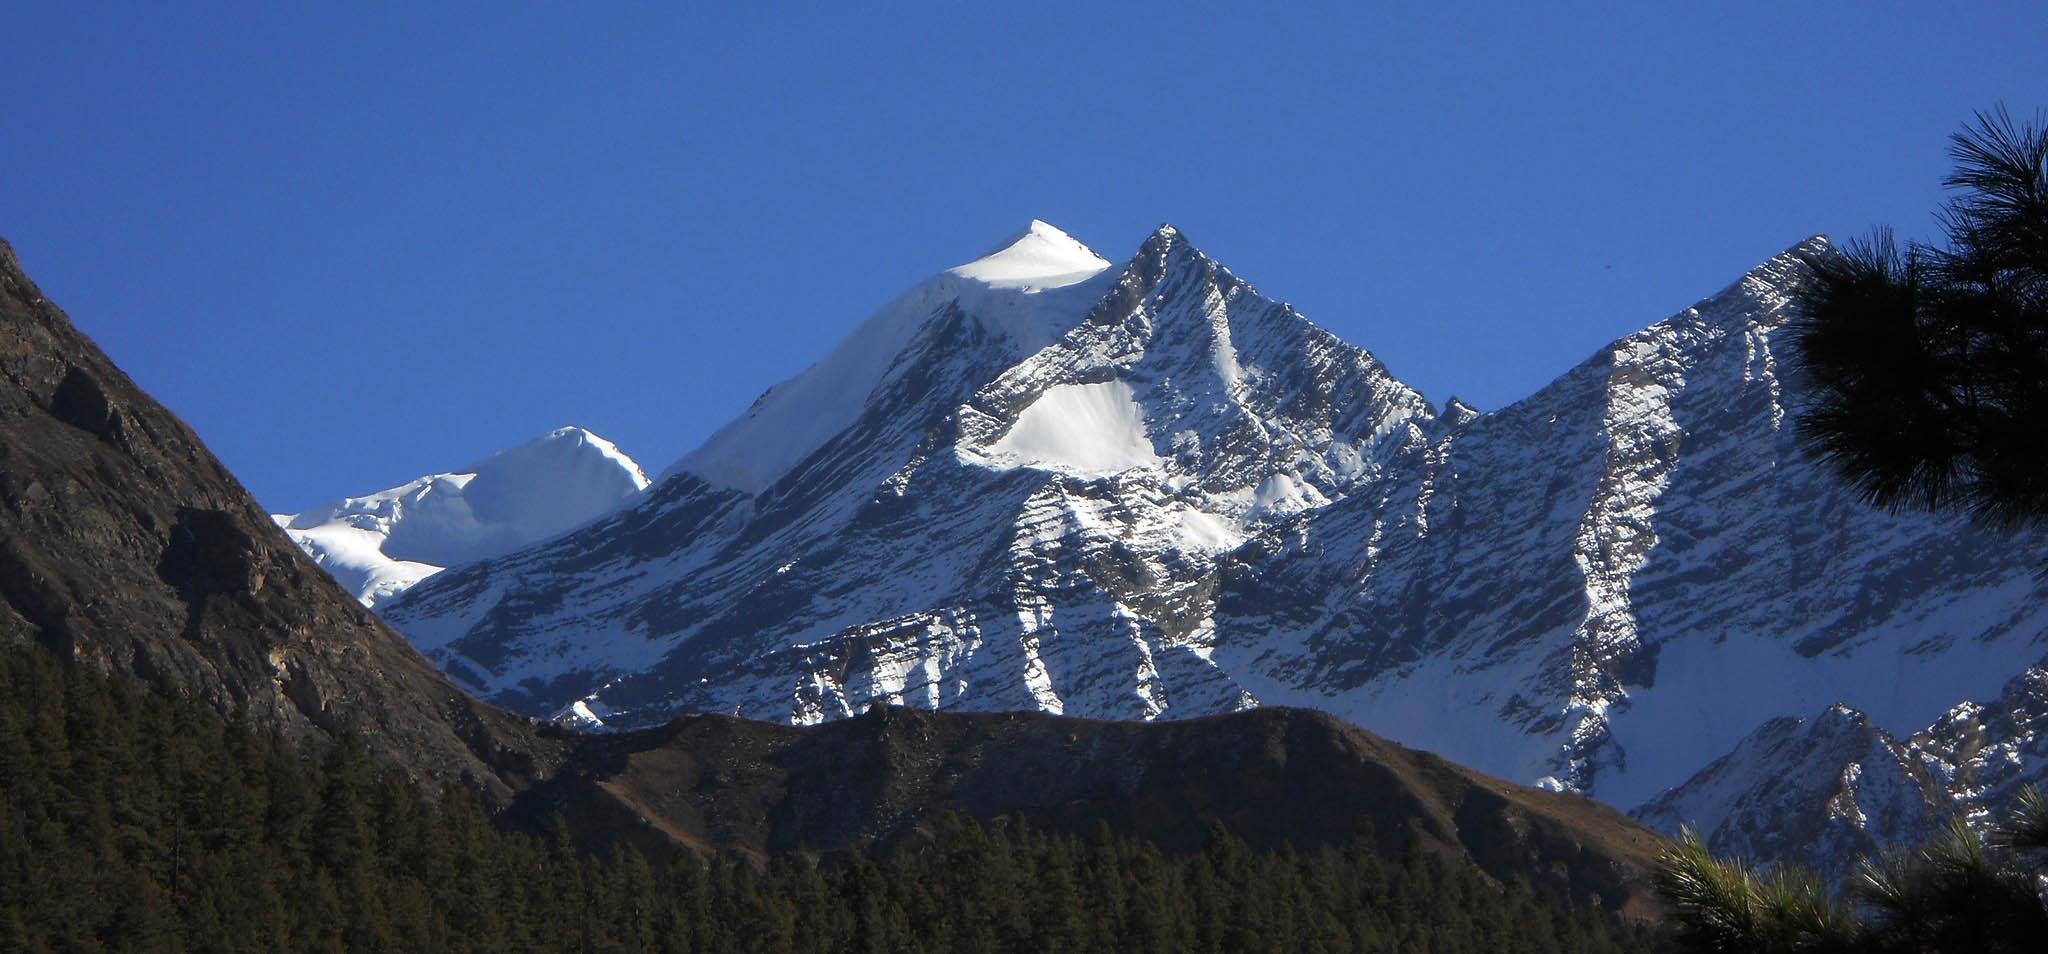 Dolpo Region Trekking in Nepal